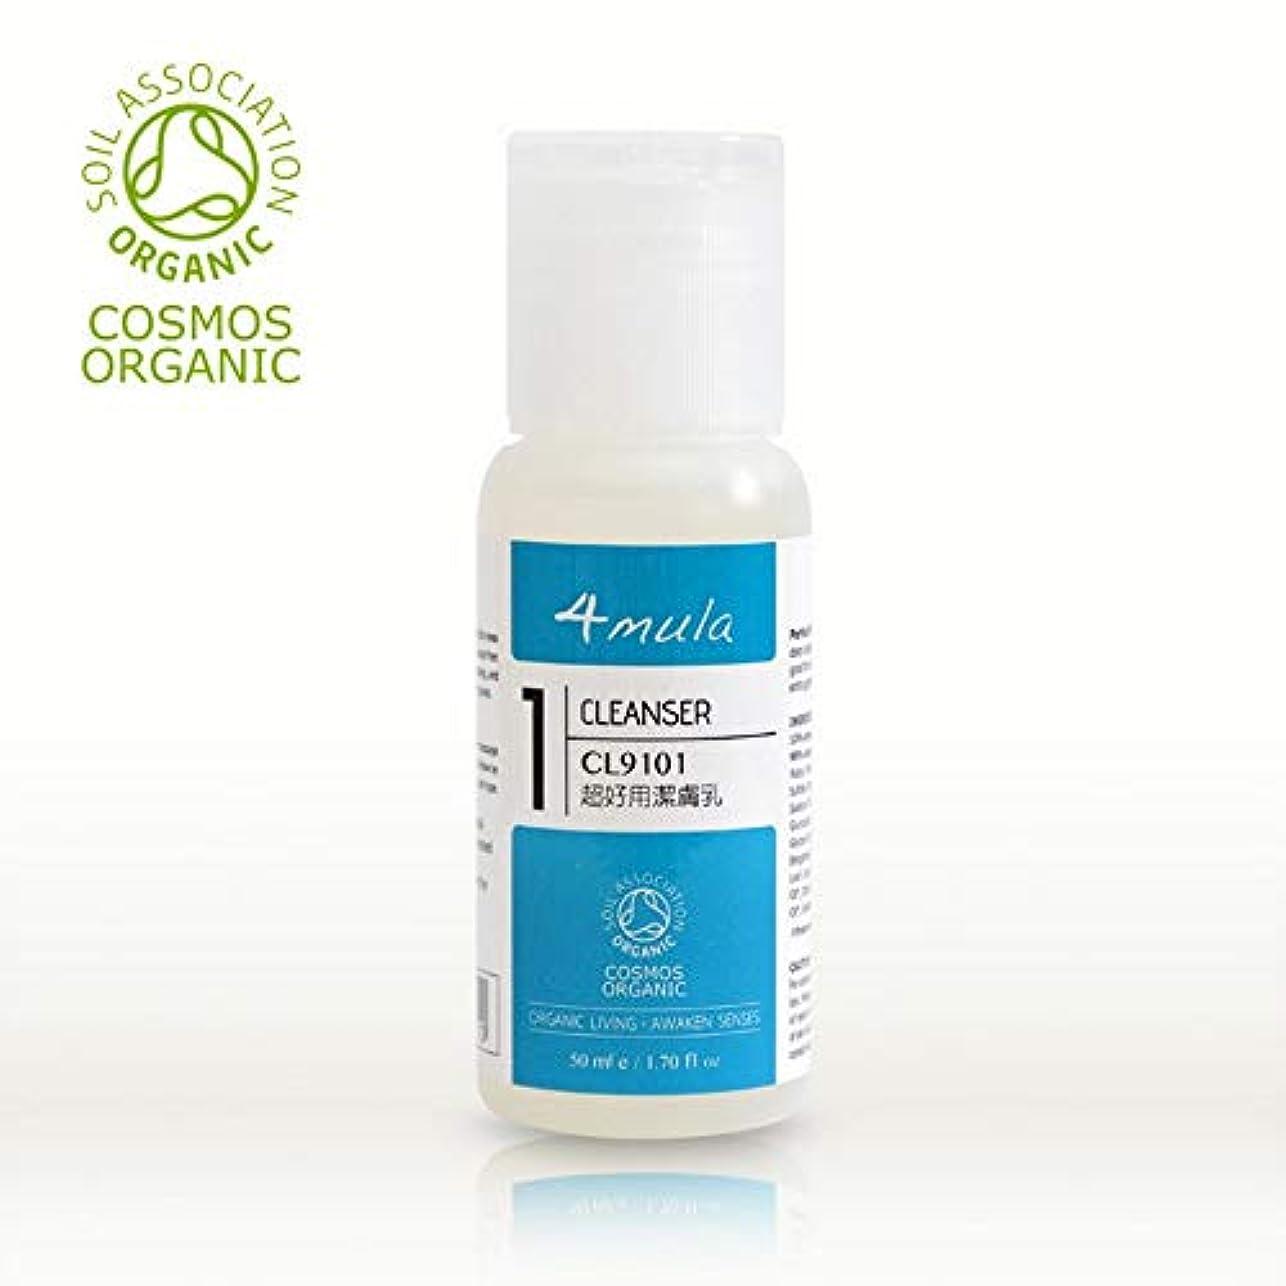 質量異常な耐久CL9101 超好用潔膚乳 PERFECT WASH CL9101 50ml/1.70 fl oz